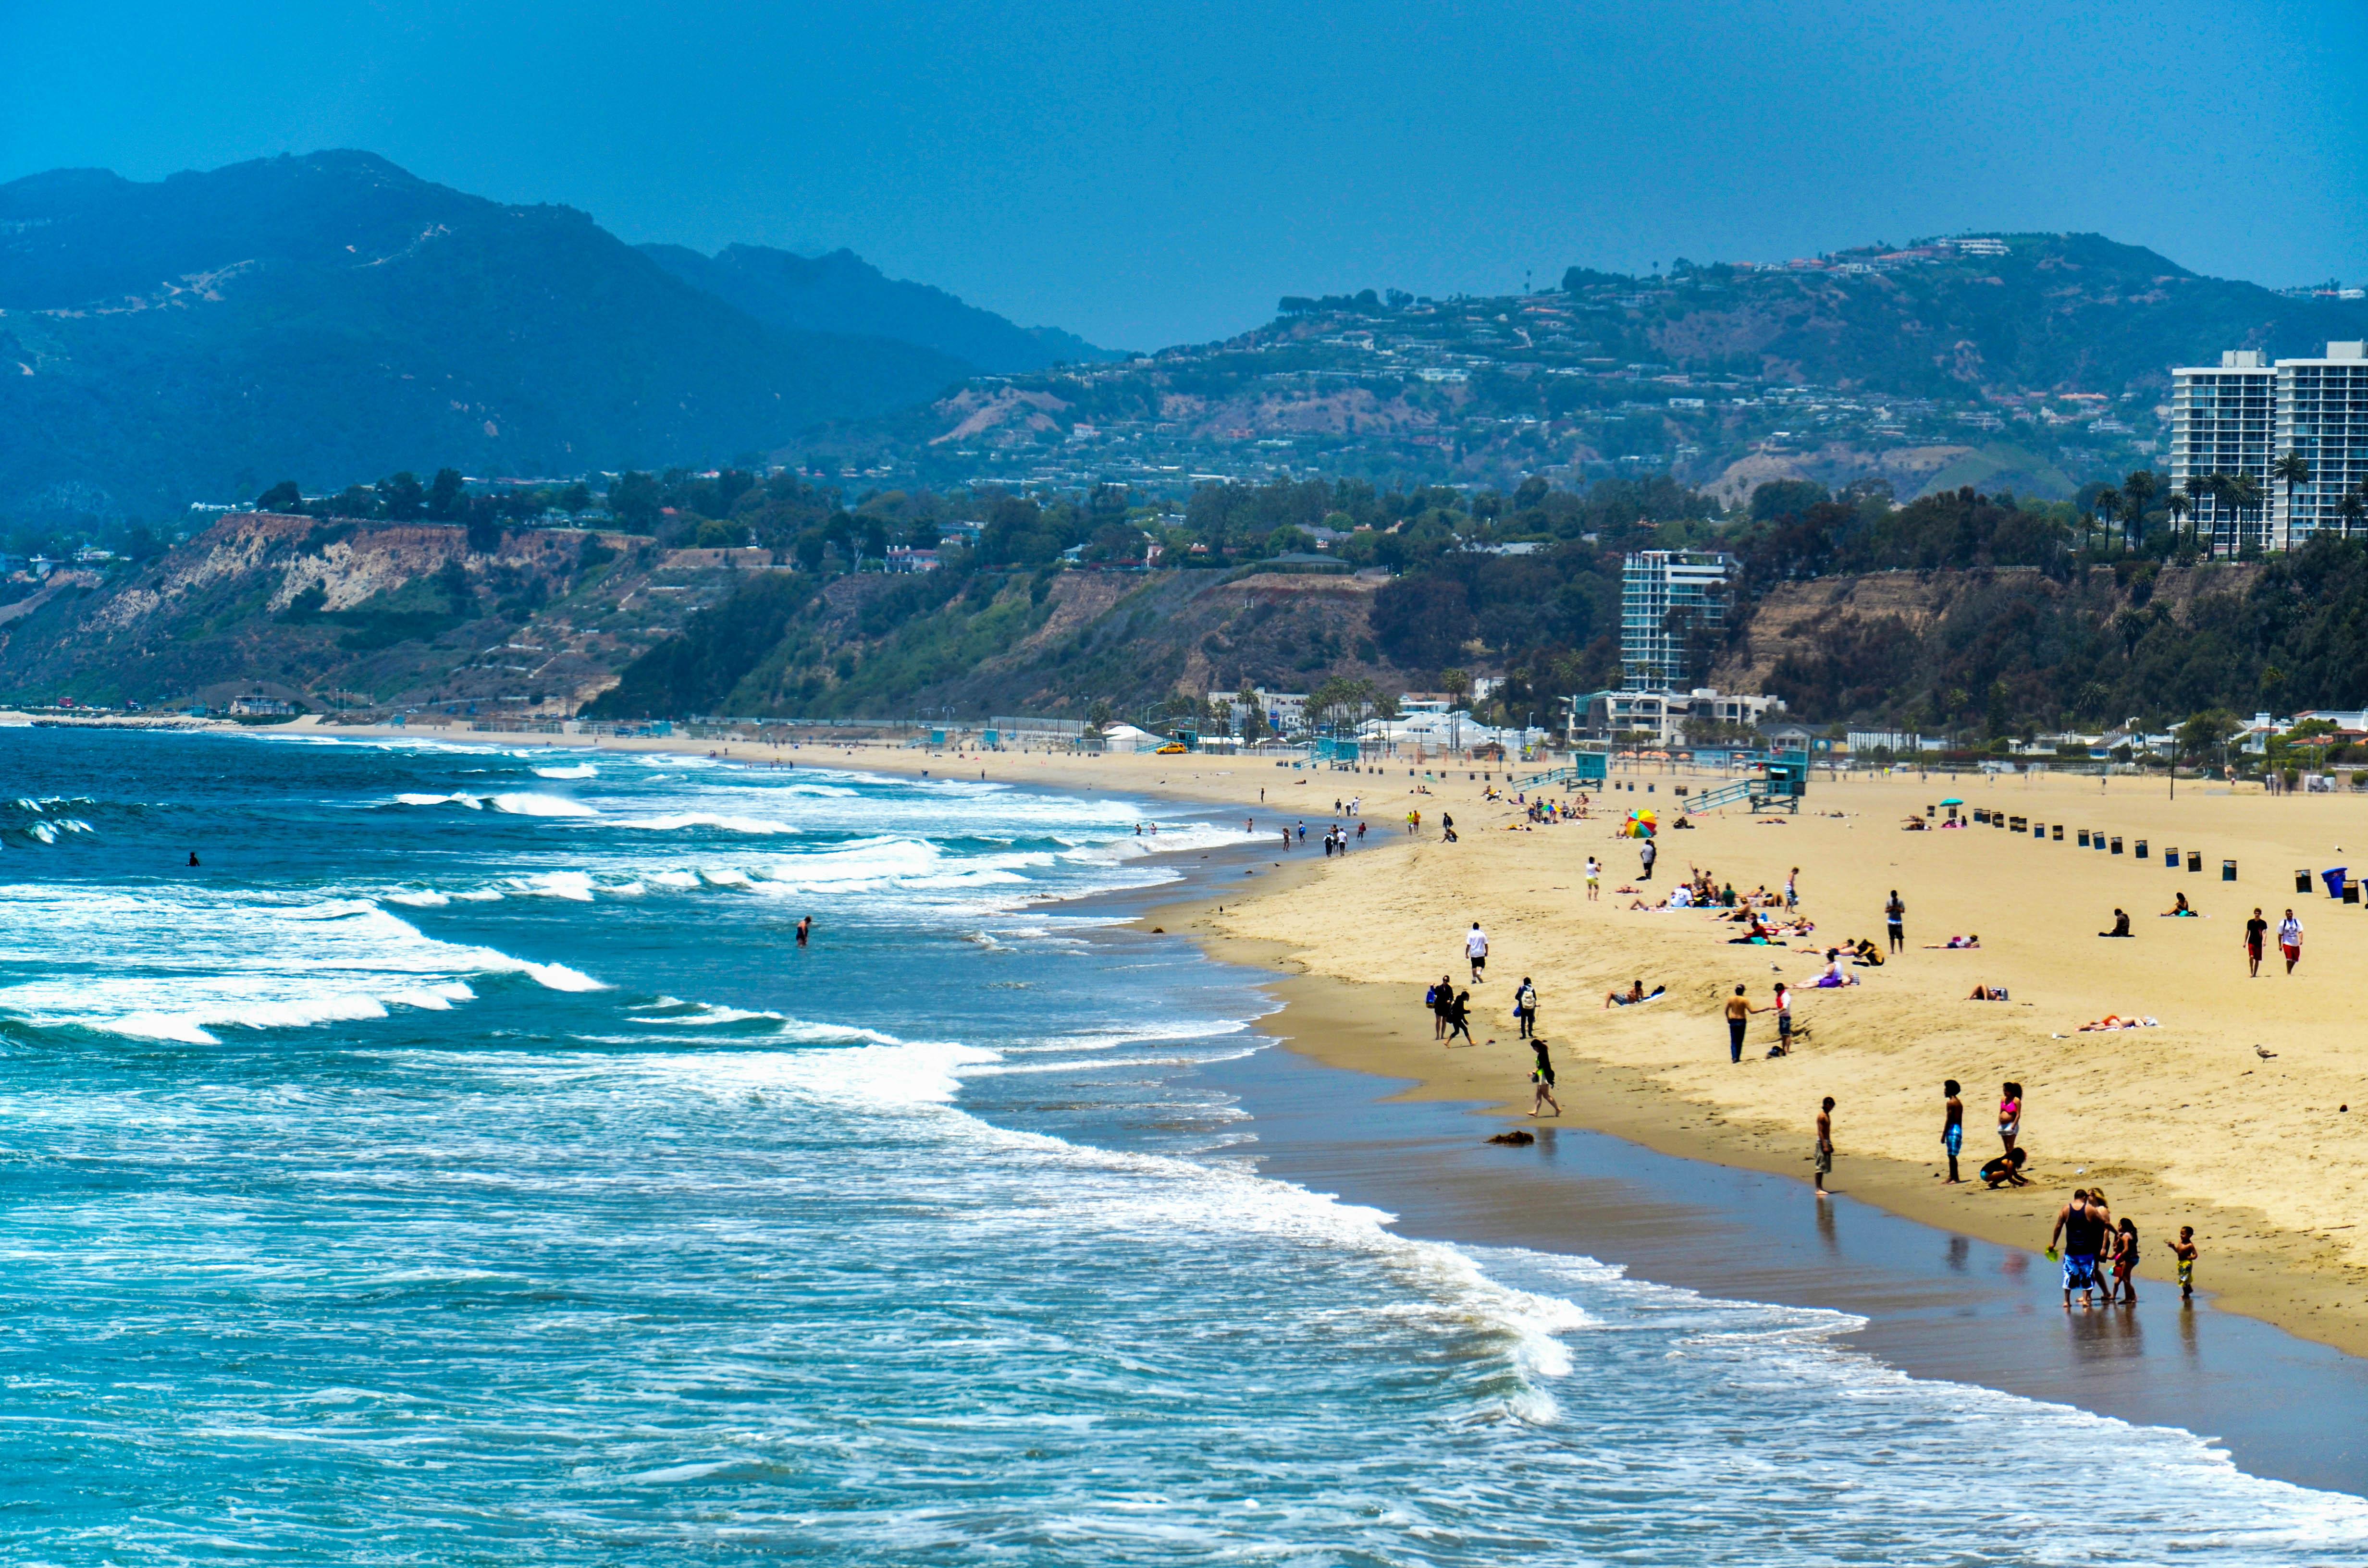 Hotels Venice Beach Los Angeles